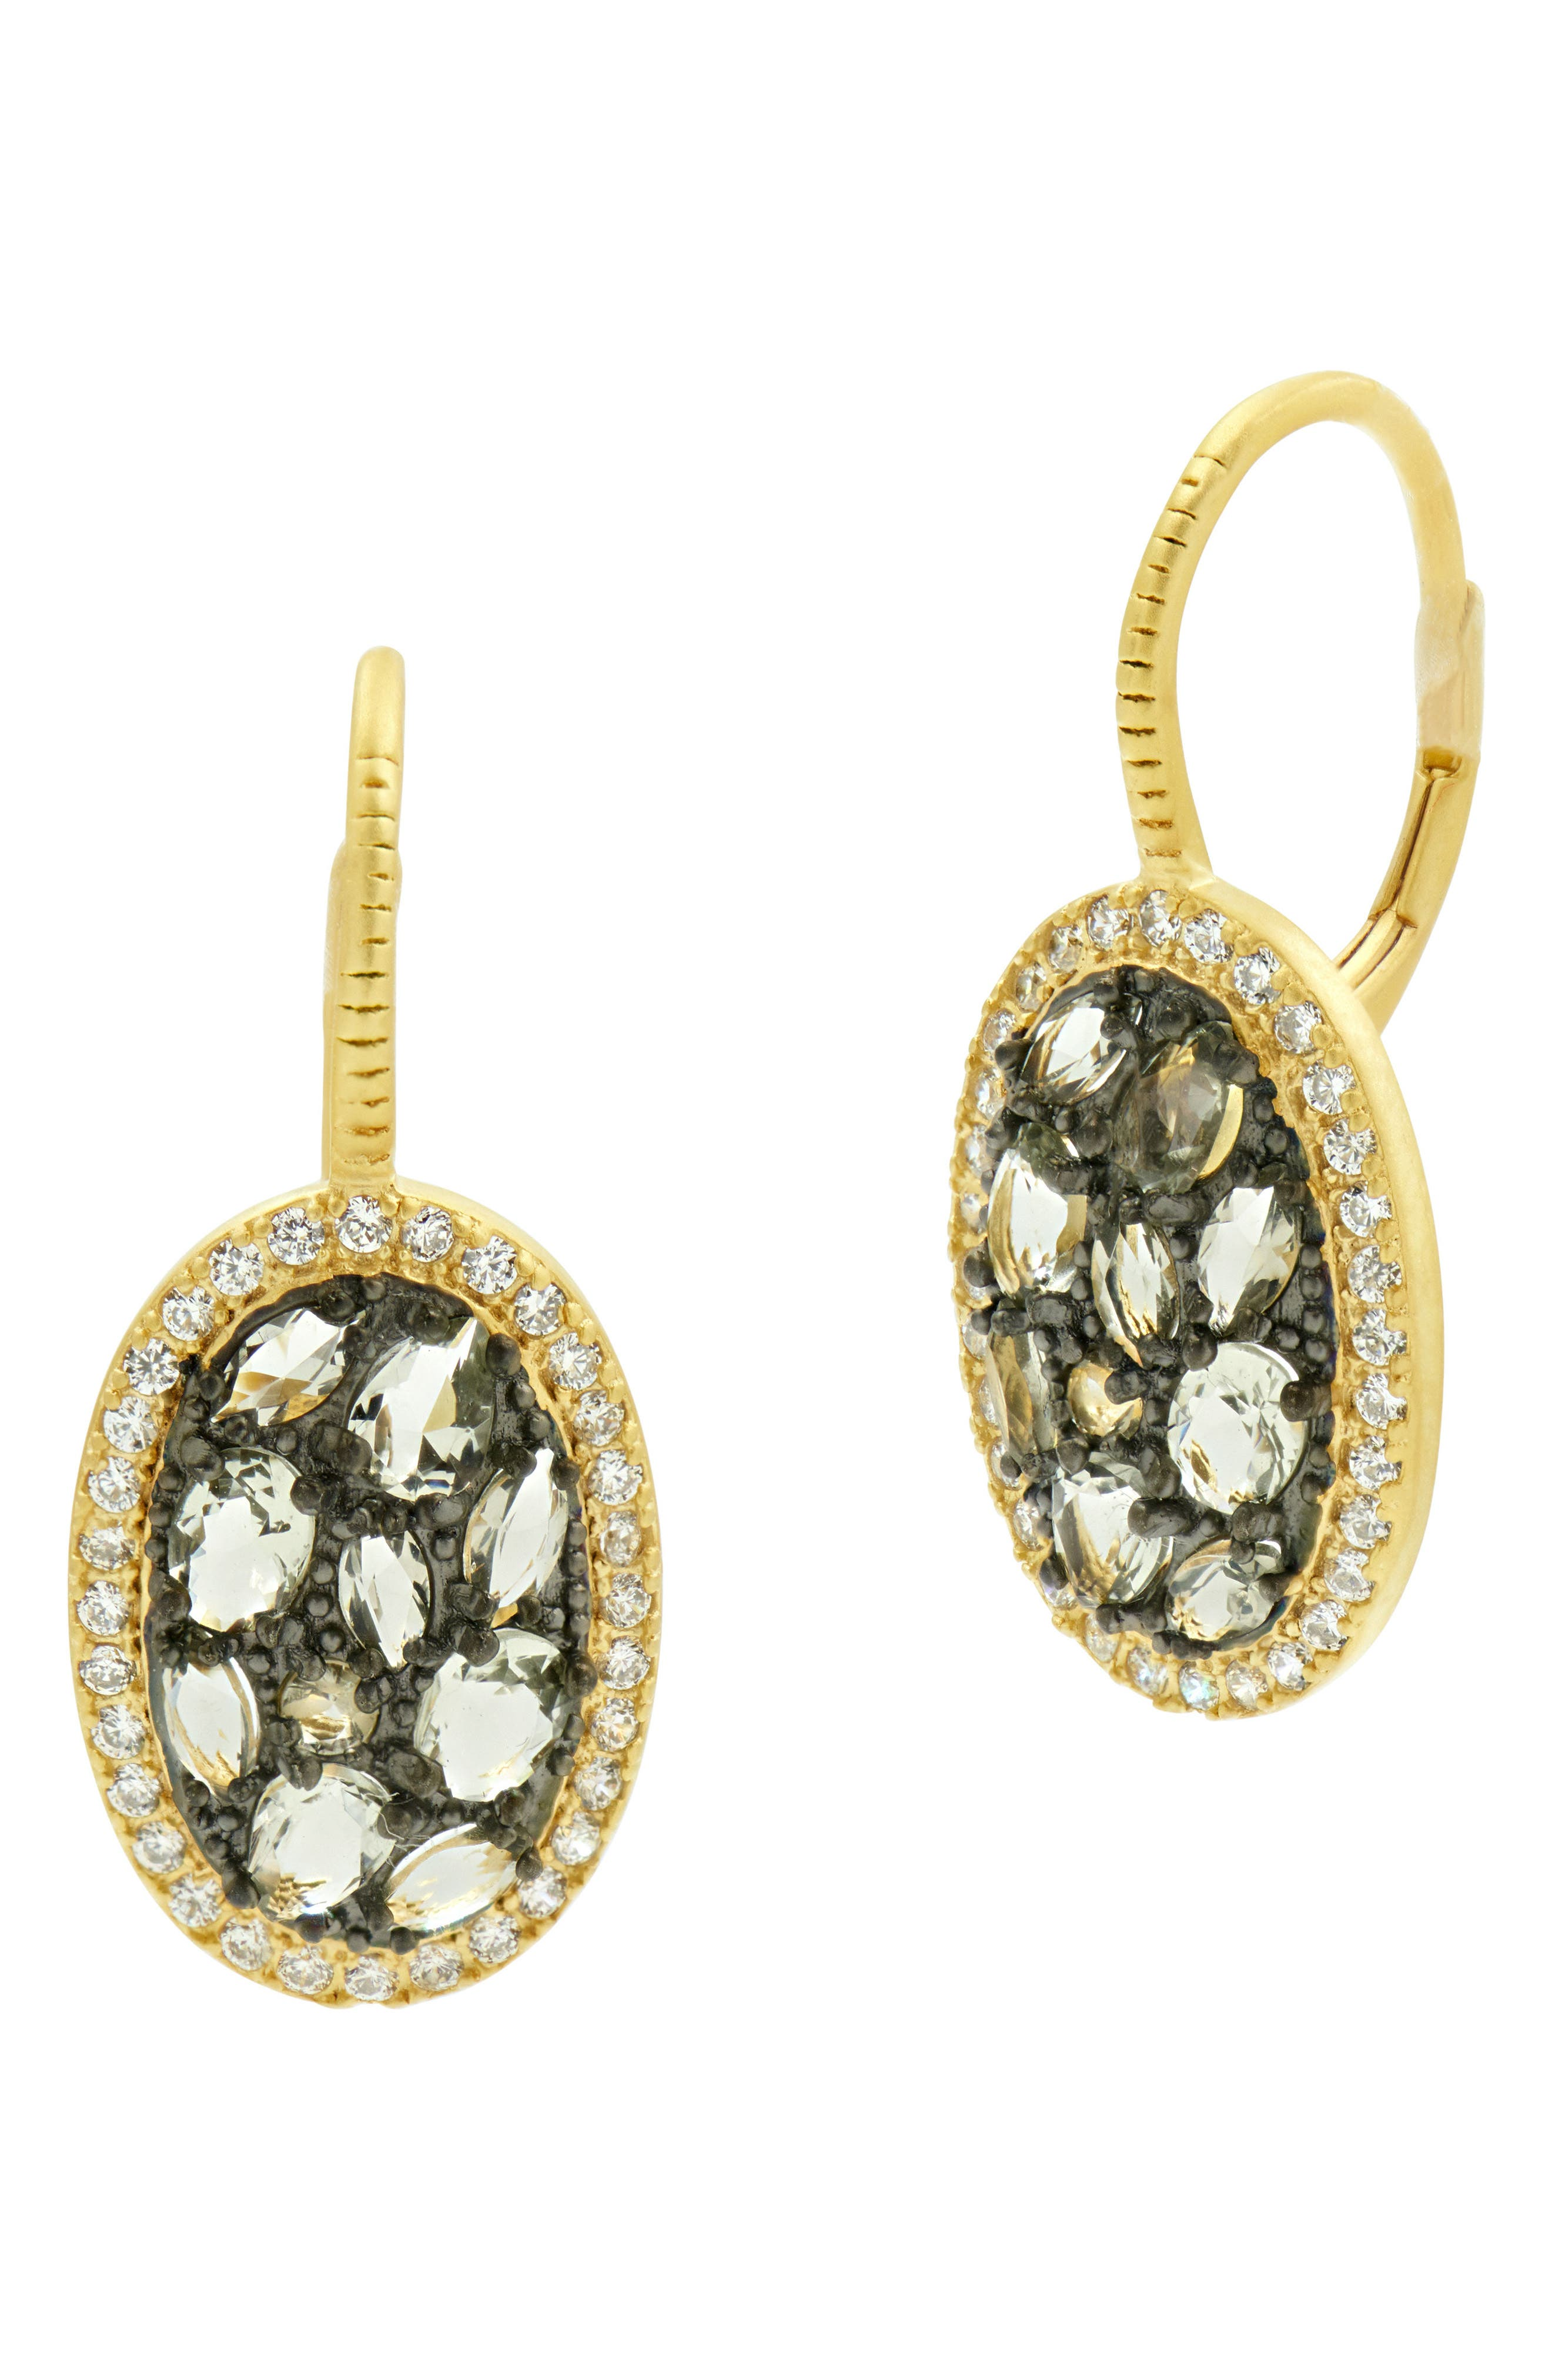 Rose Dor Stone Earrings,                             Main thumbnail 1, color,                             Black/ Gold